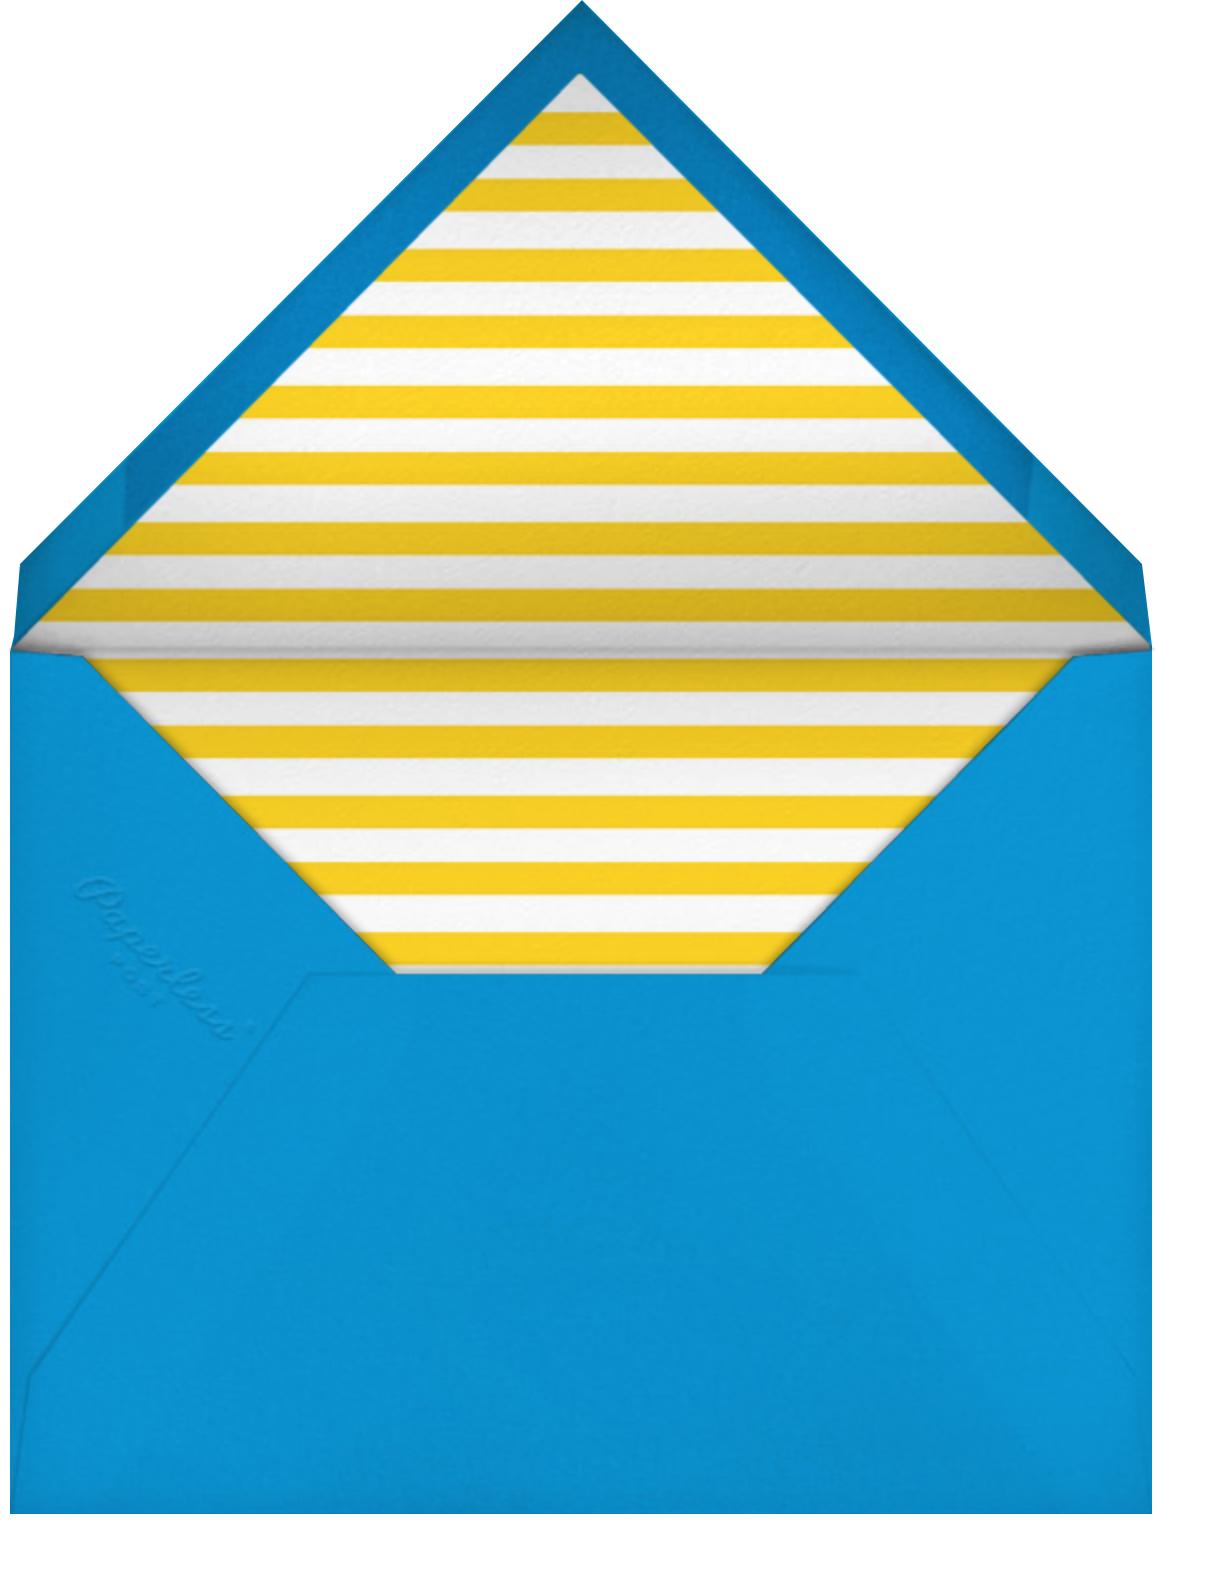 Quint - Citrus/Gold - Paperless Post - Kids' birthday - envelope back